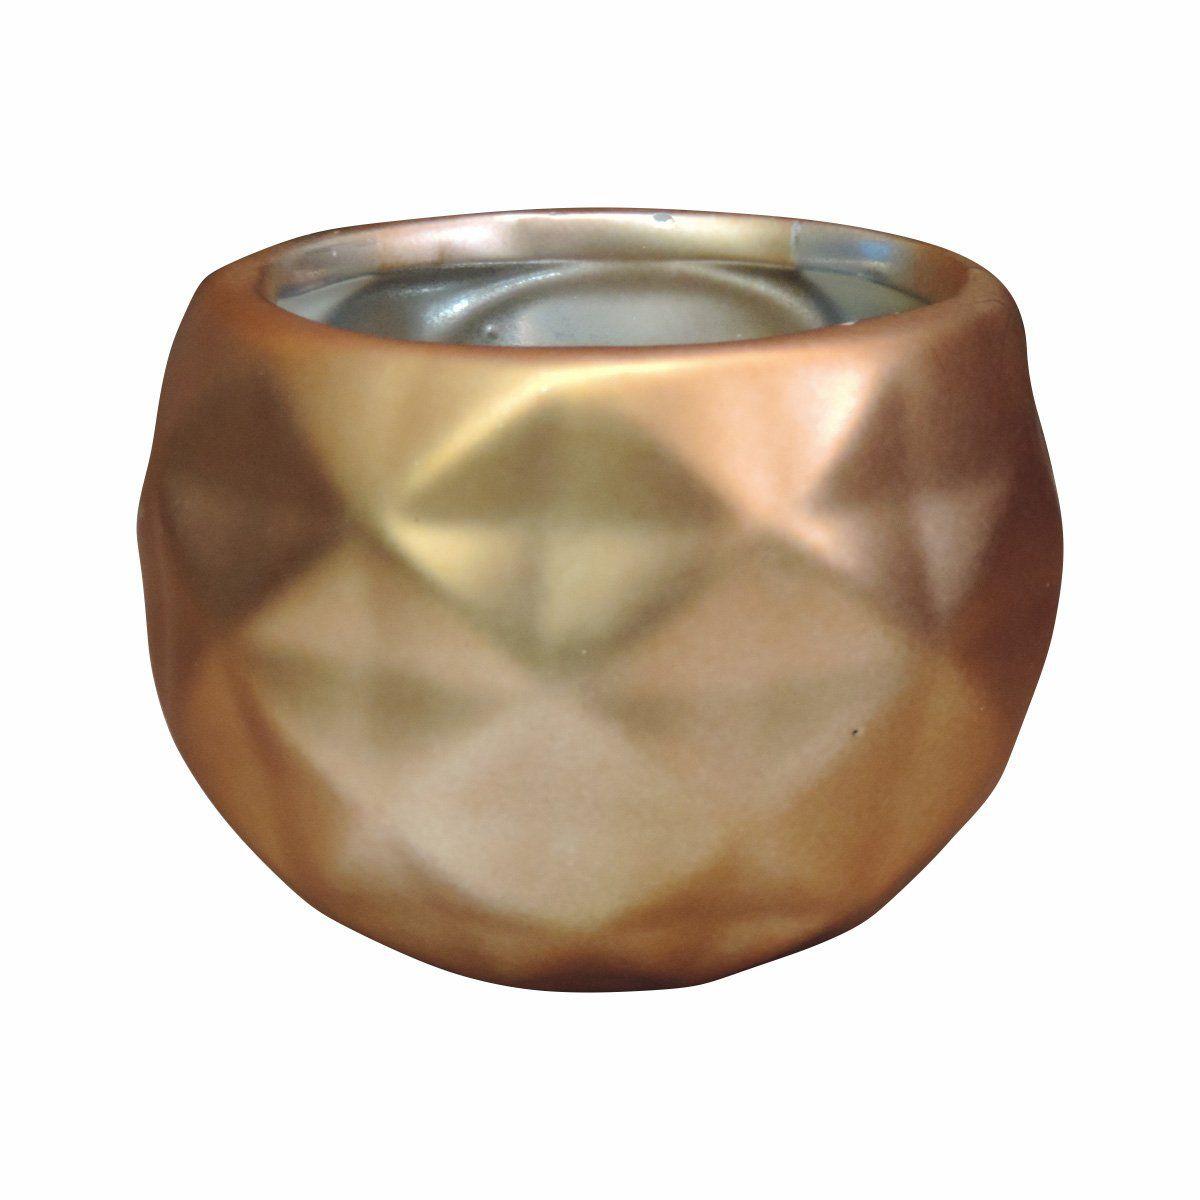 Vaso Magnético Geométrico 6,5cm x 6,5cm